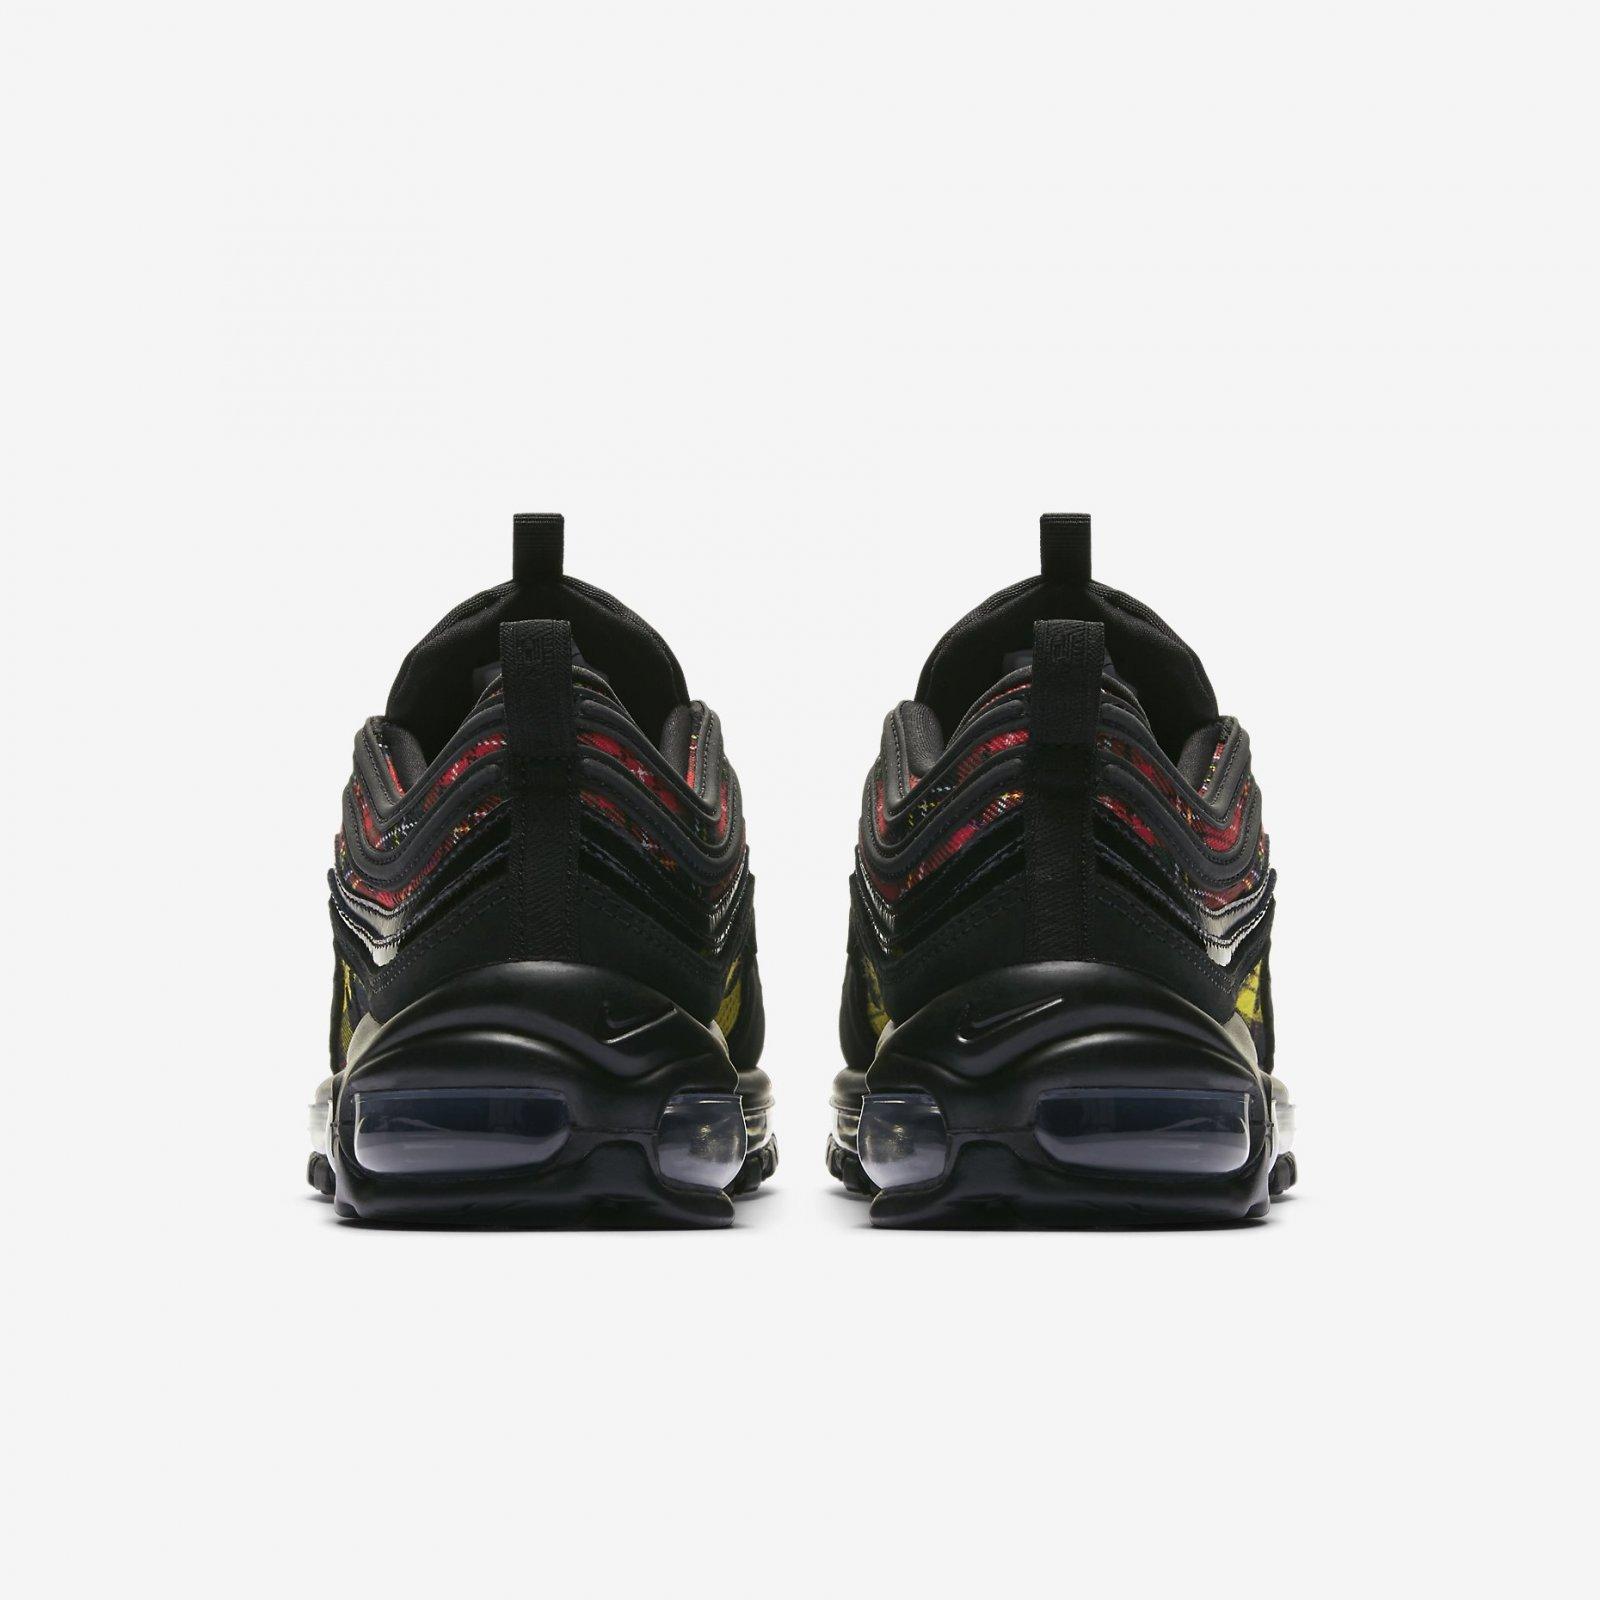 huge discount fc379 f0a03 Nike Women s Air Max 97 SE Tartan Black University Red Running Shoes  AV8220-001. Nike